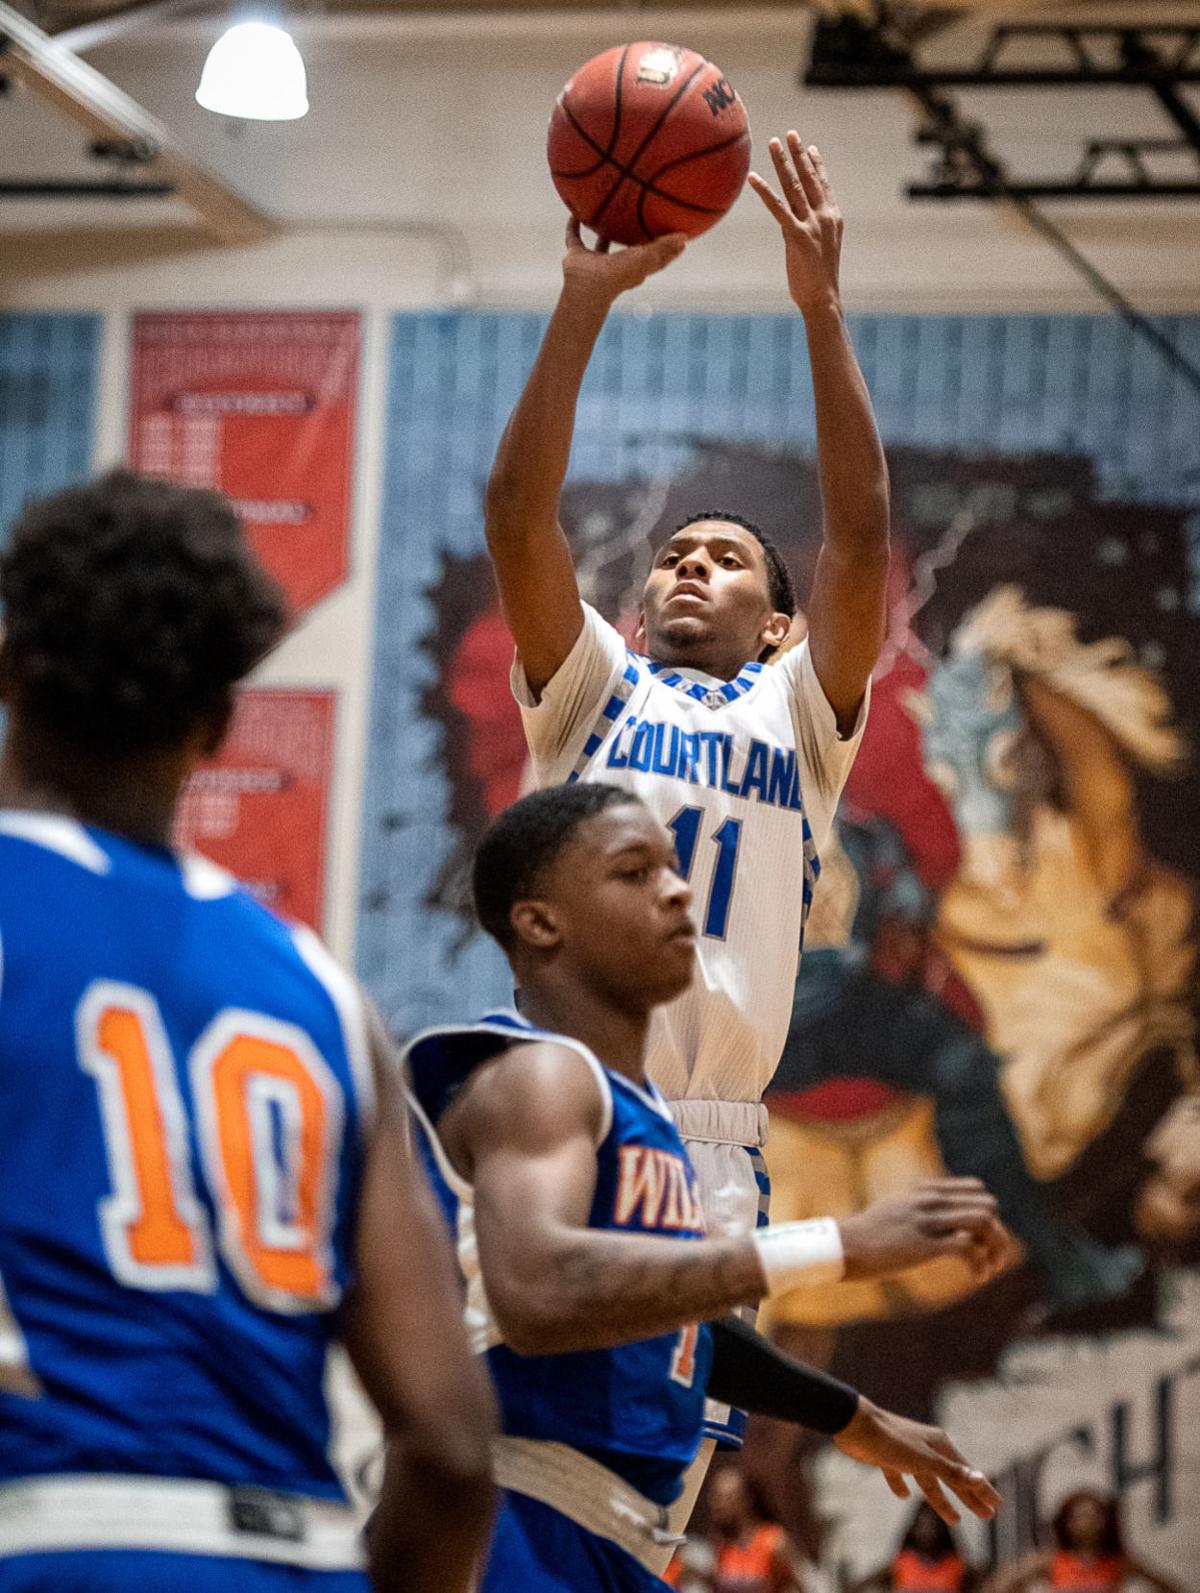 Courtland vs Woodrow Wilson boys basketball